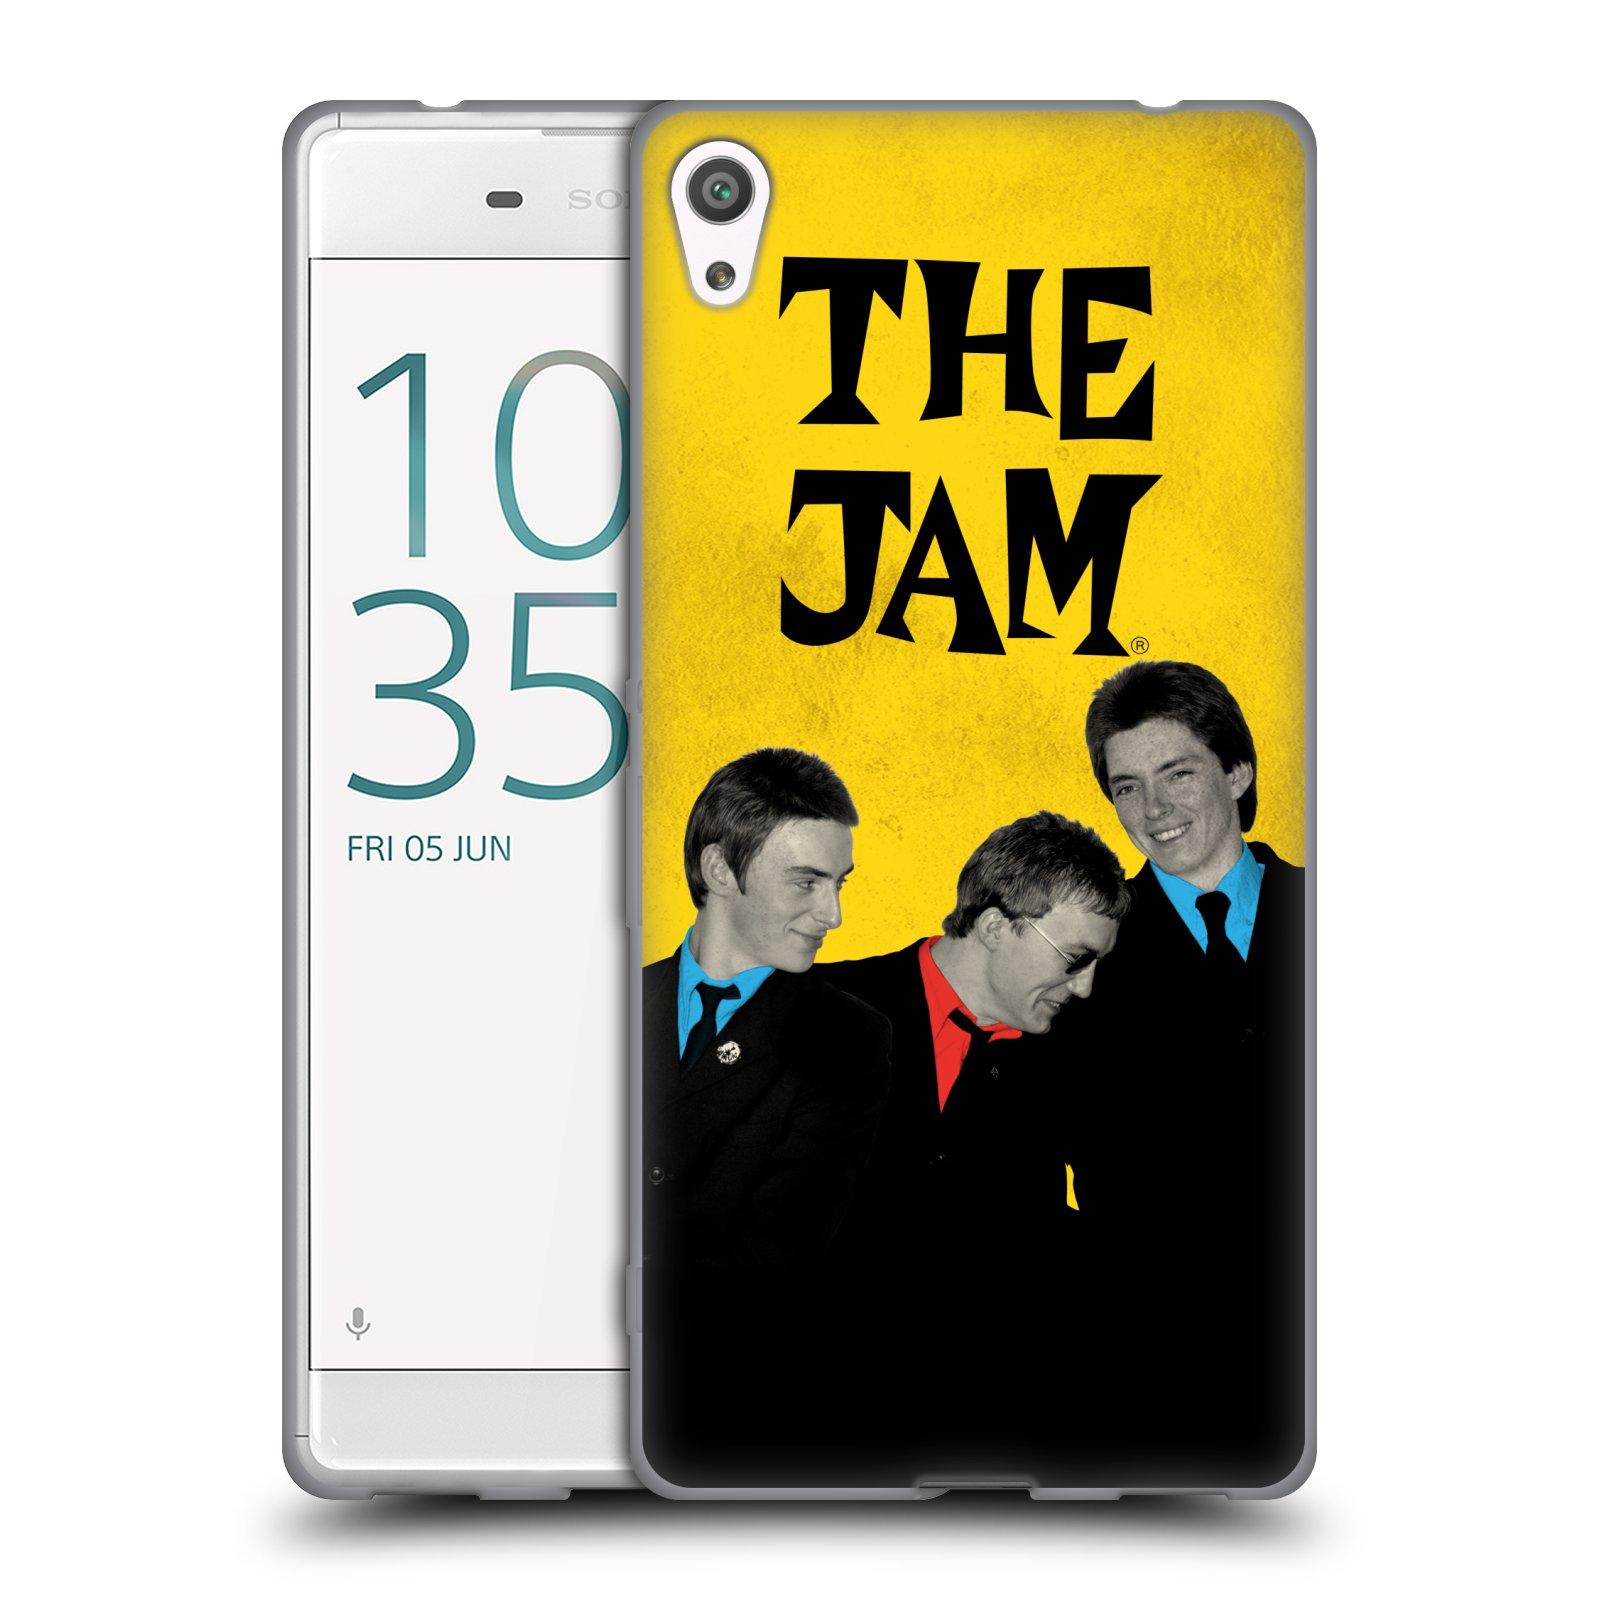 HEAD CASE silikonový obal na mobil Sony Xperia XA ULTRA skupina The Jam